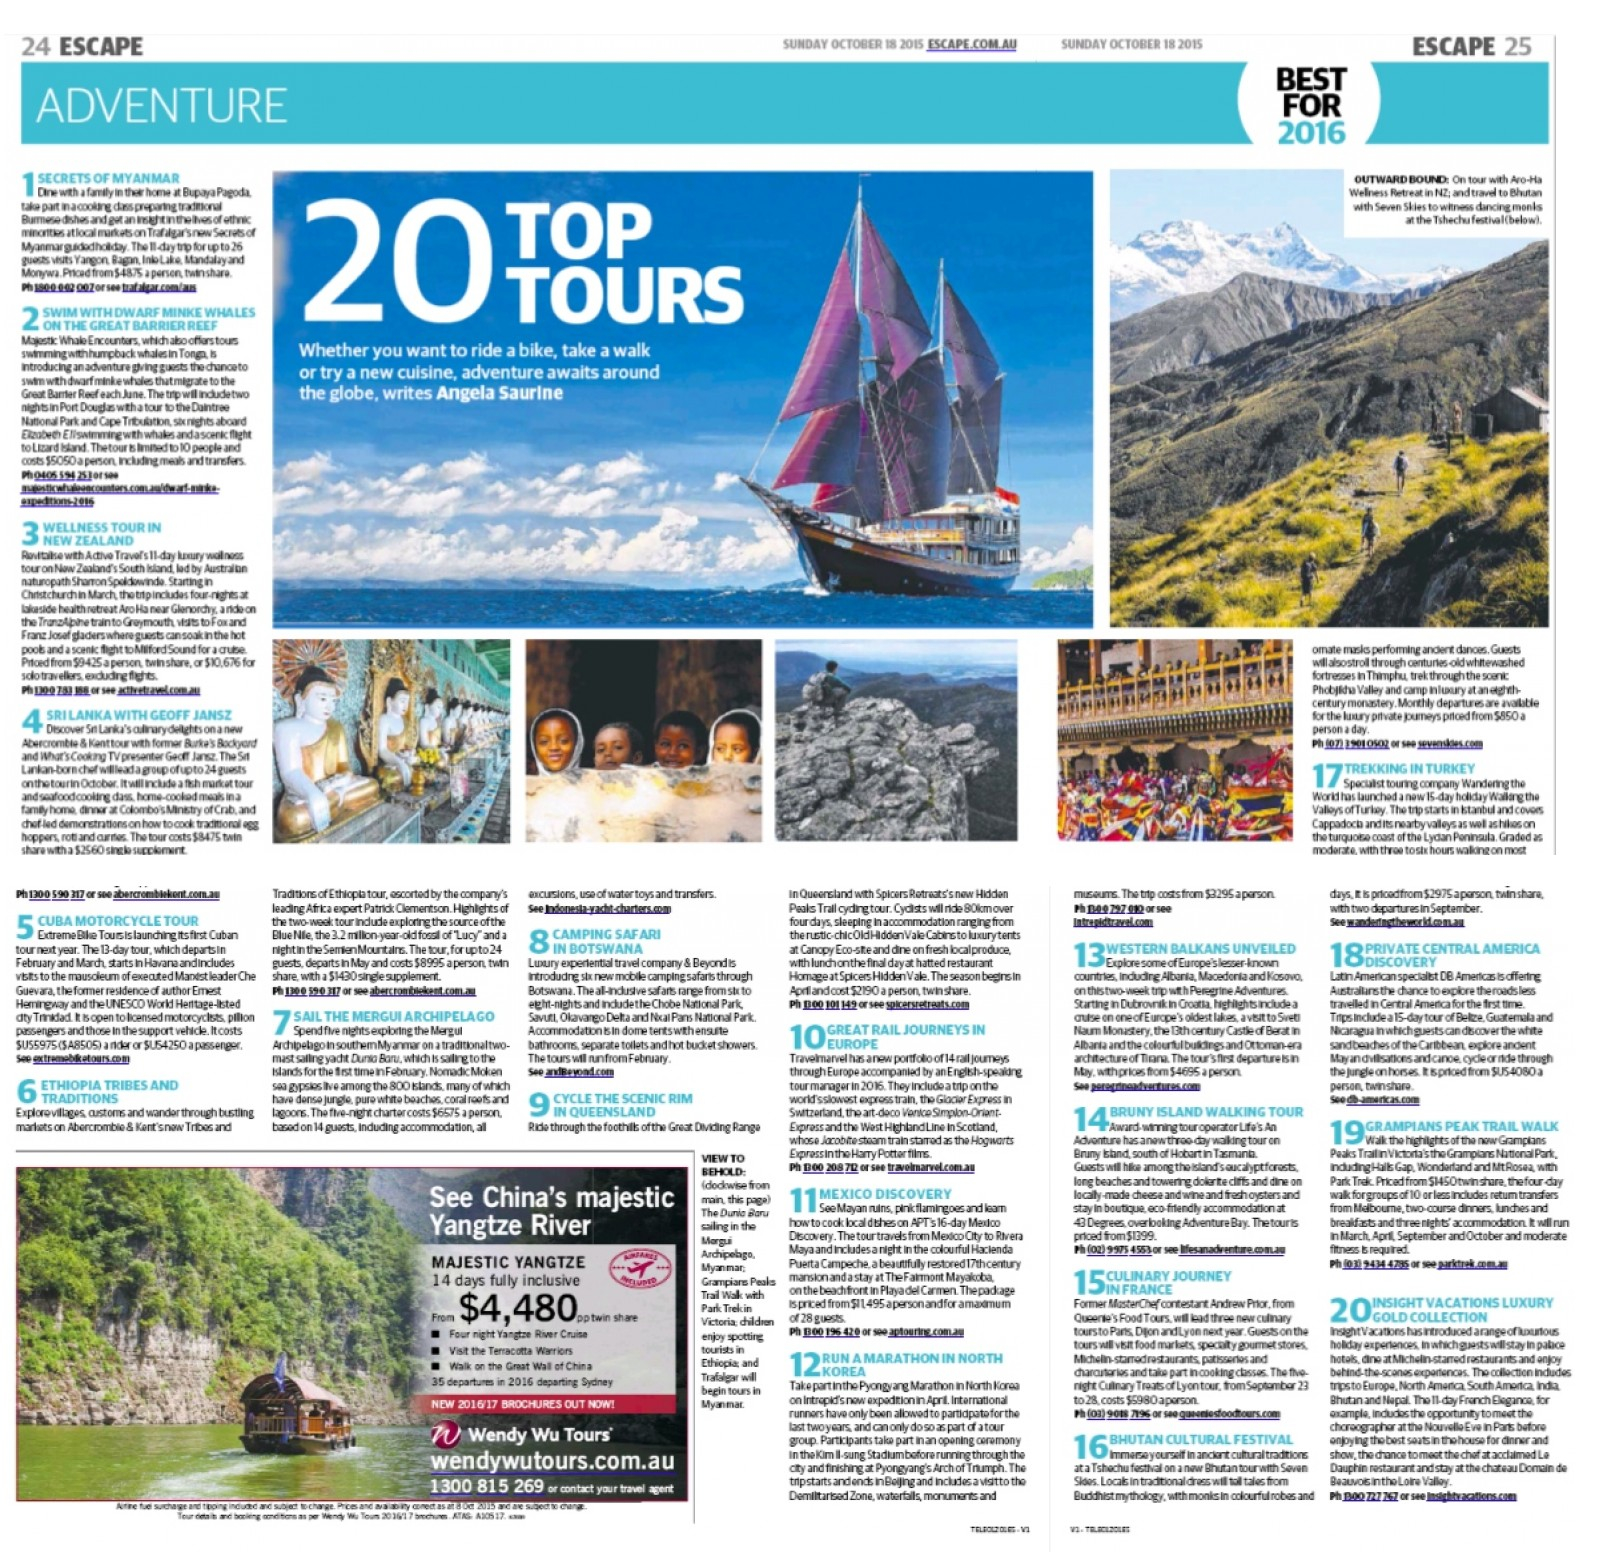 The Sunday Telegraph Australia Escape 18 October 2015.jpg